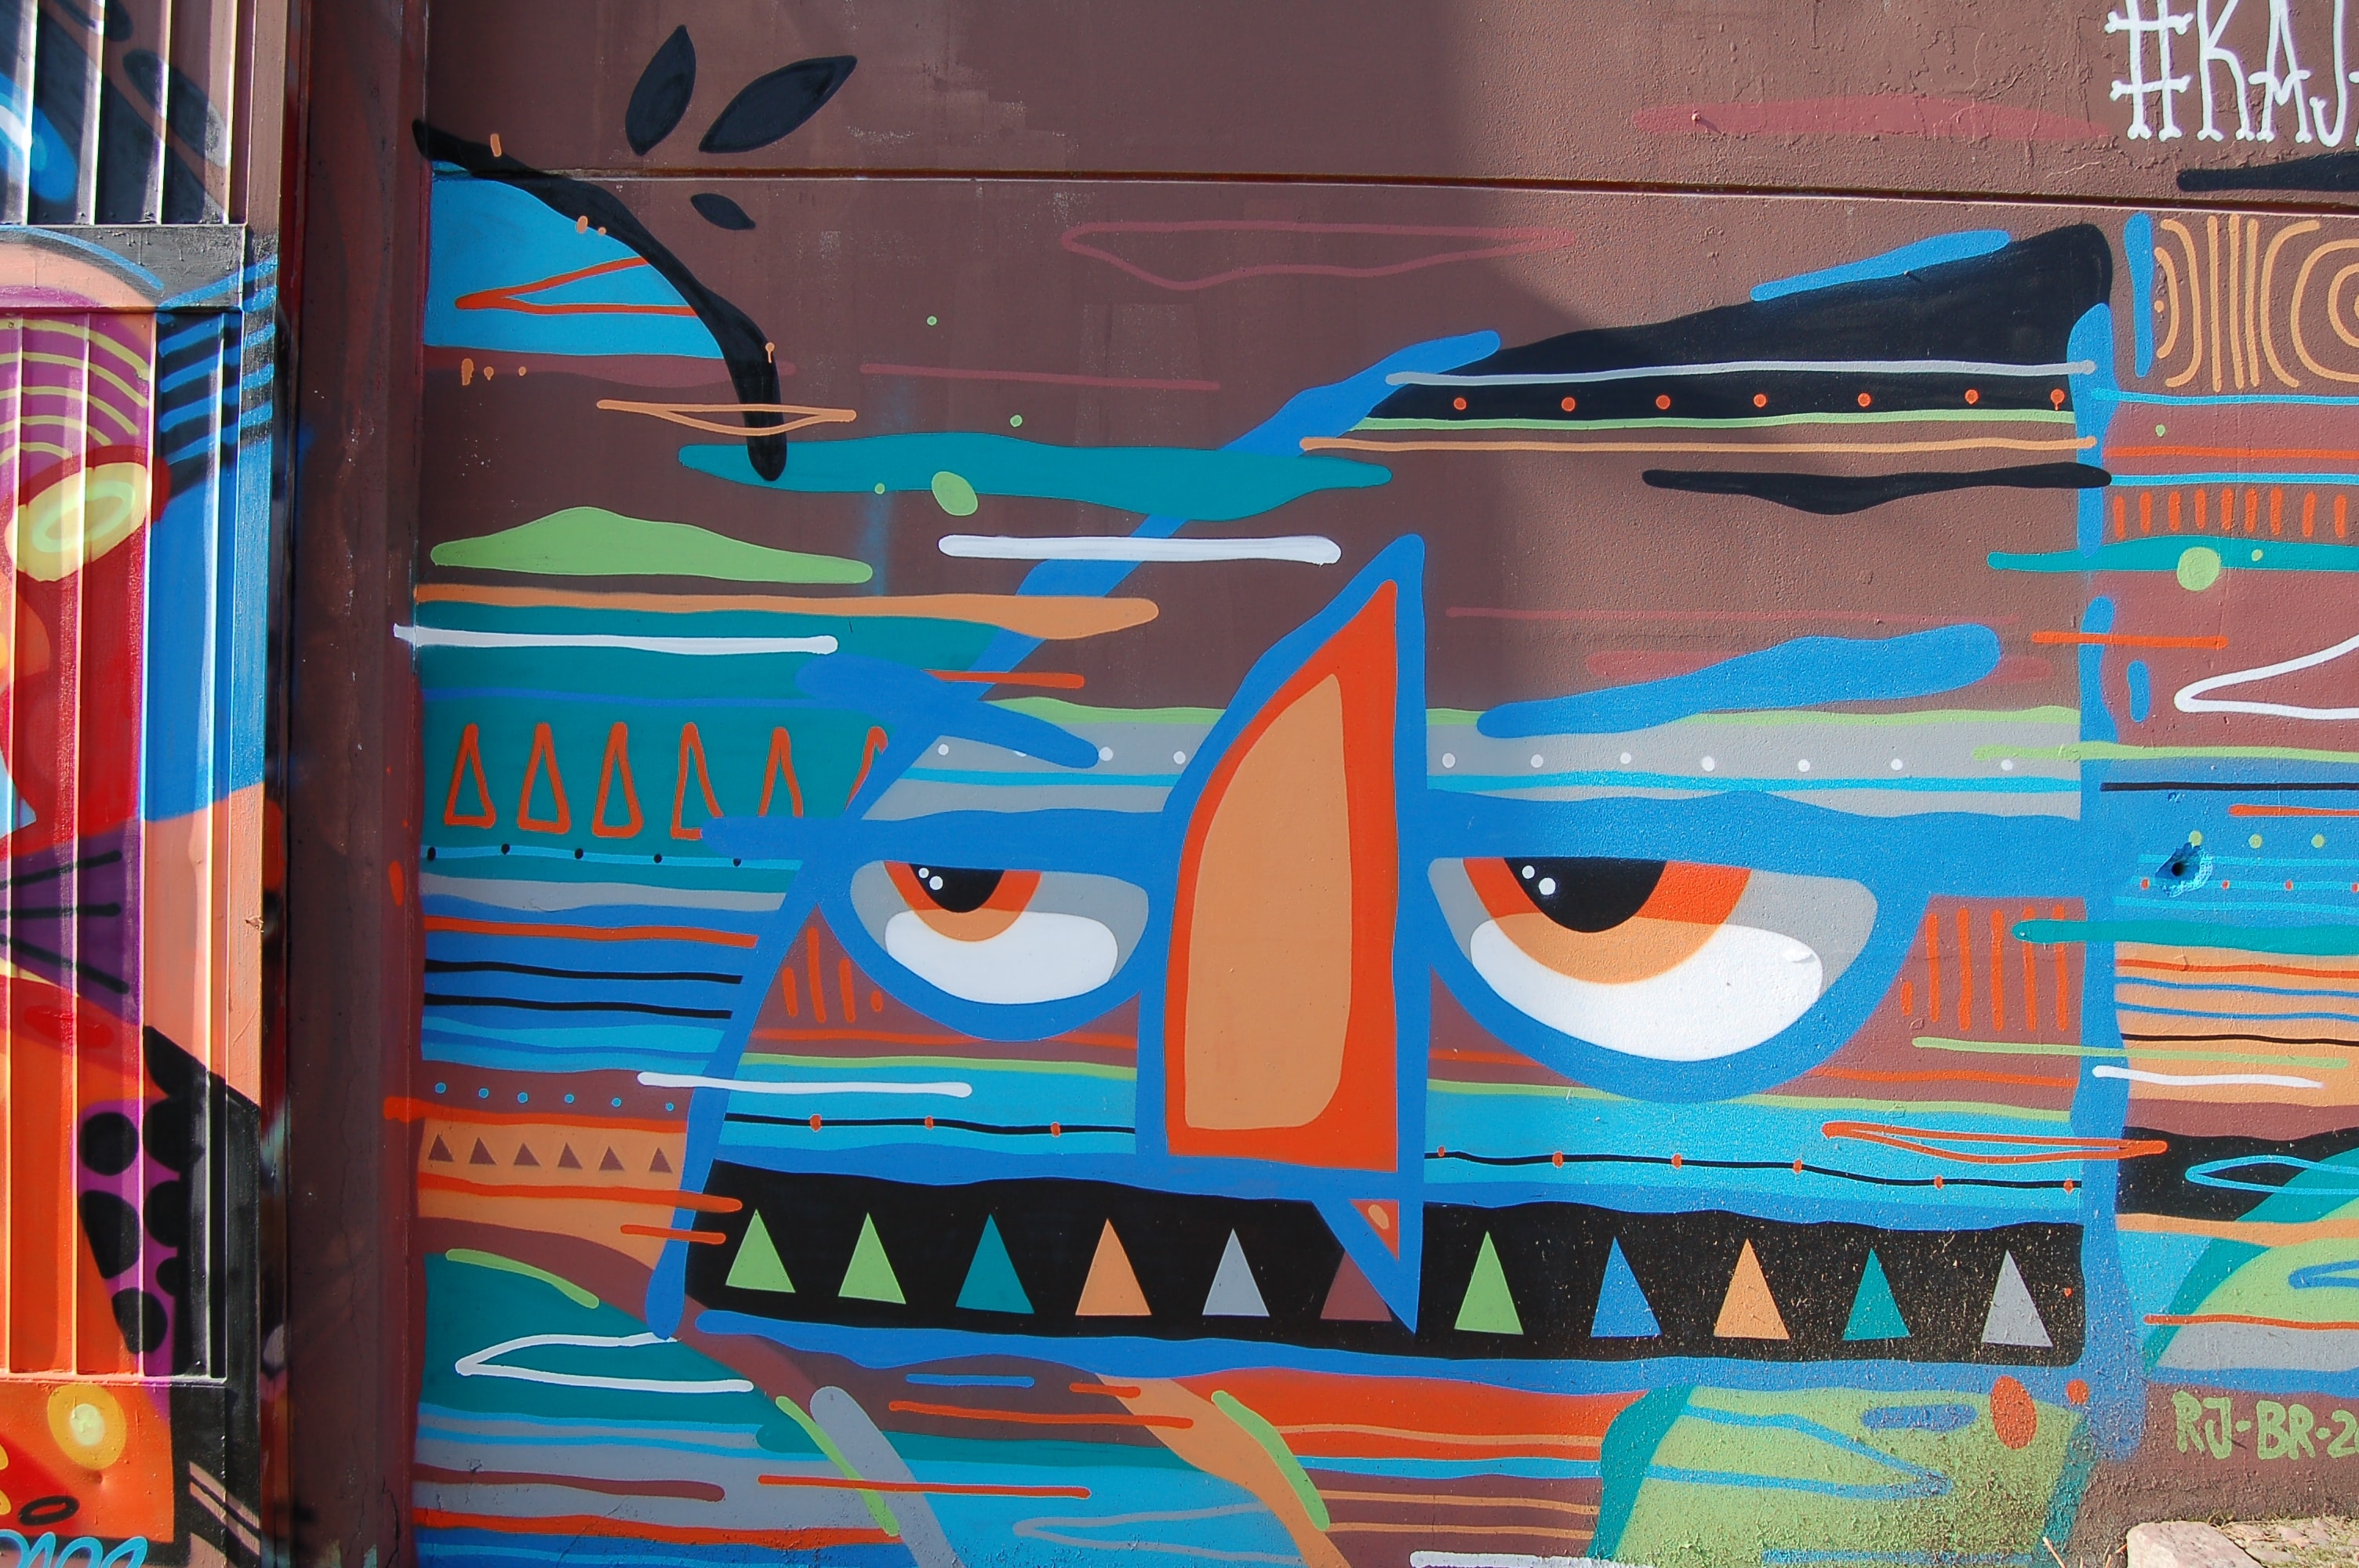 An oddly shaped cartoon face graffiti drawing.